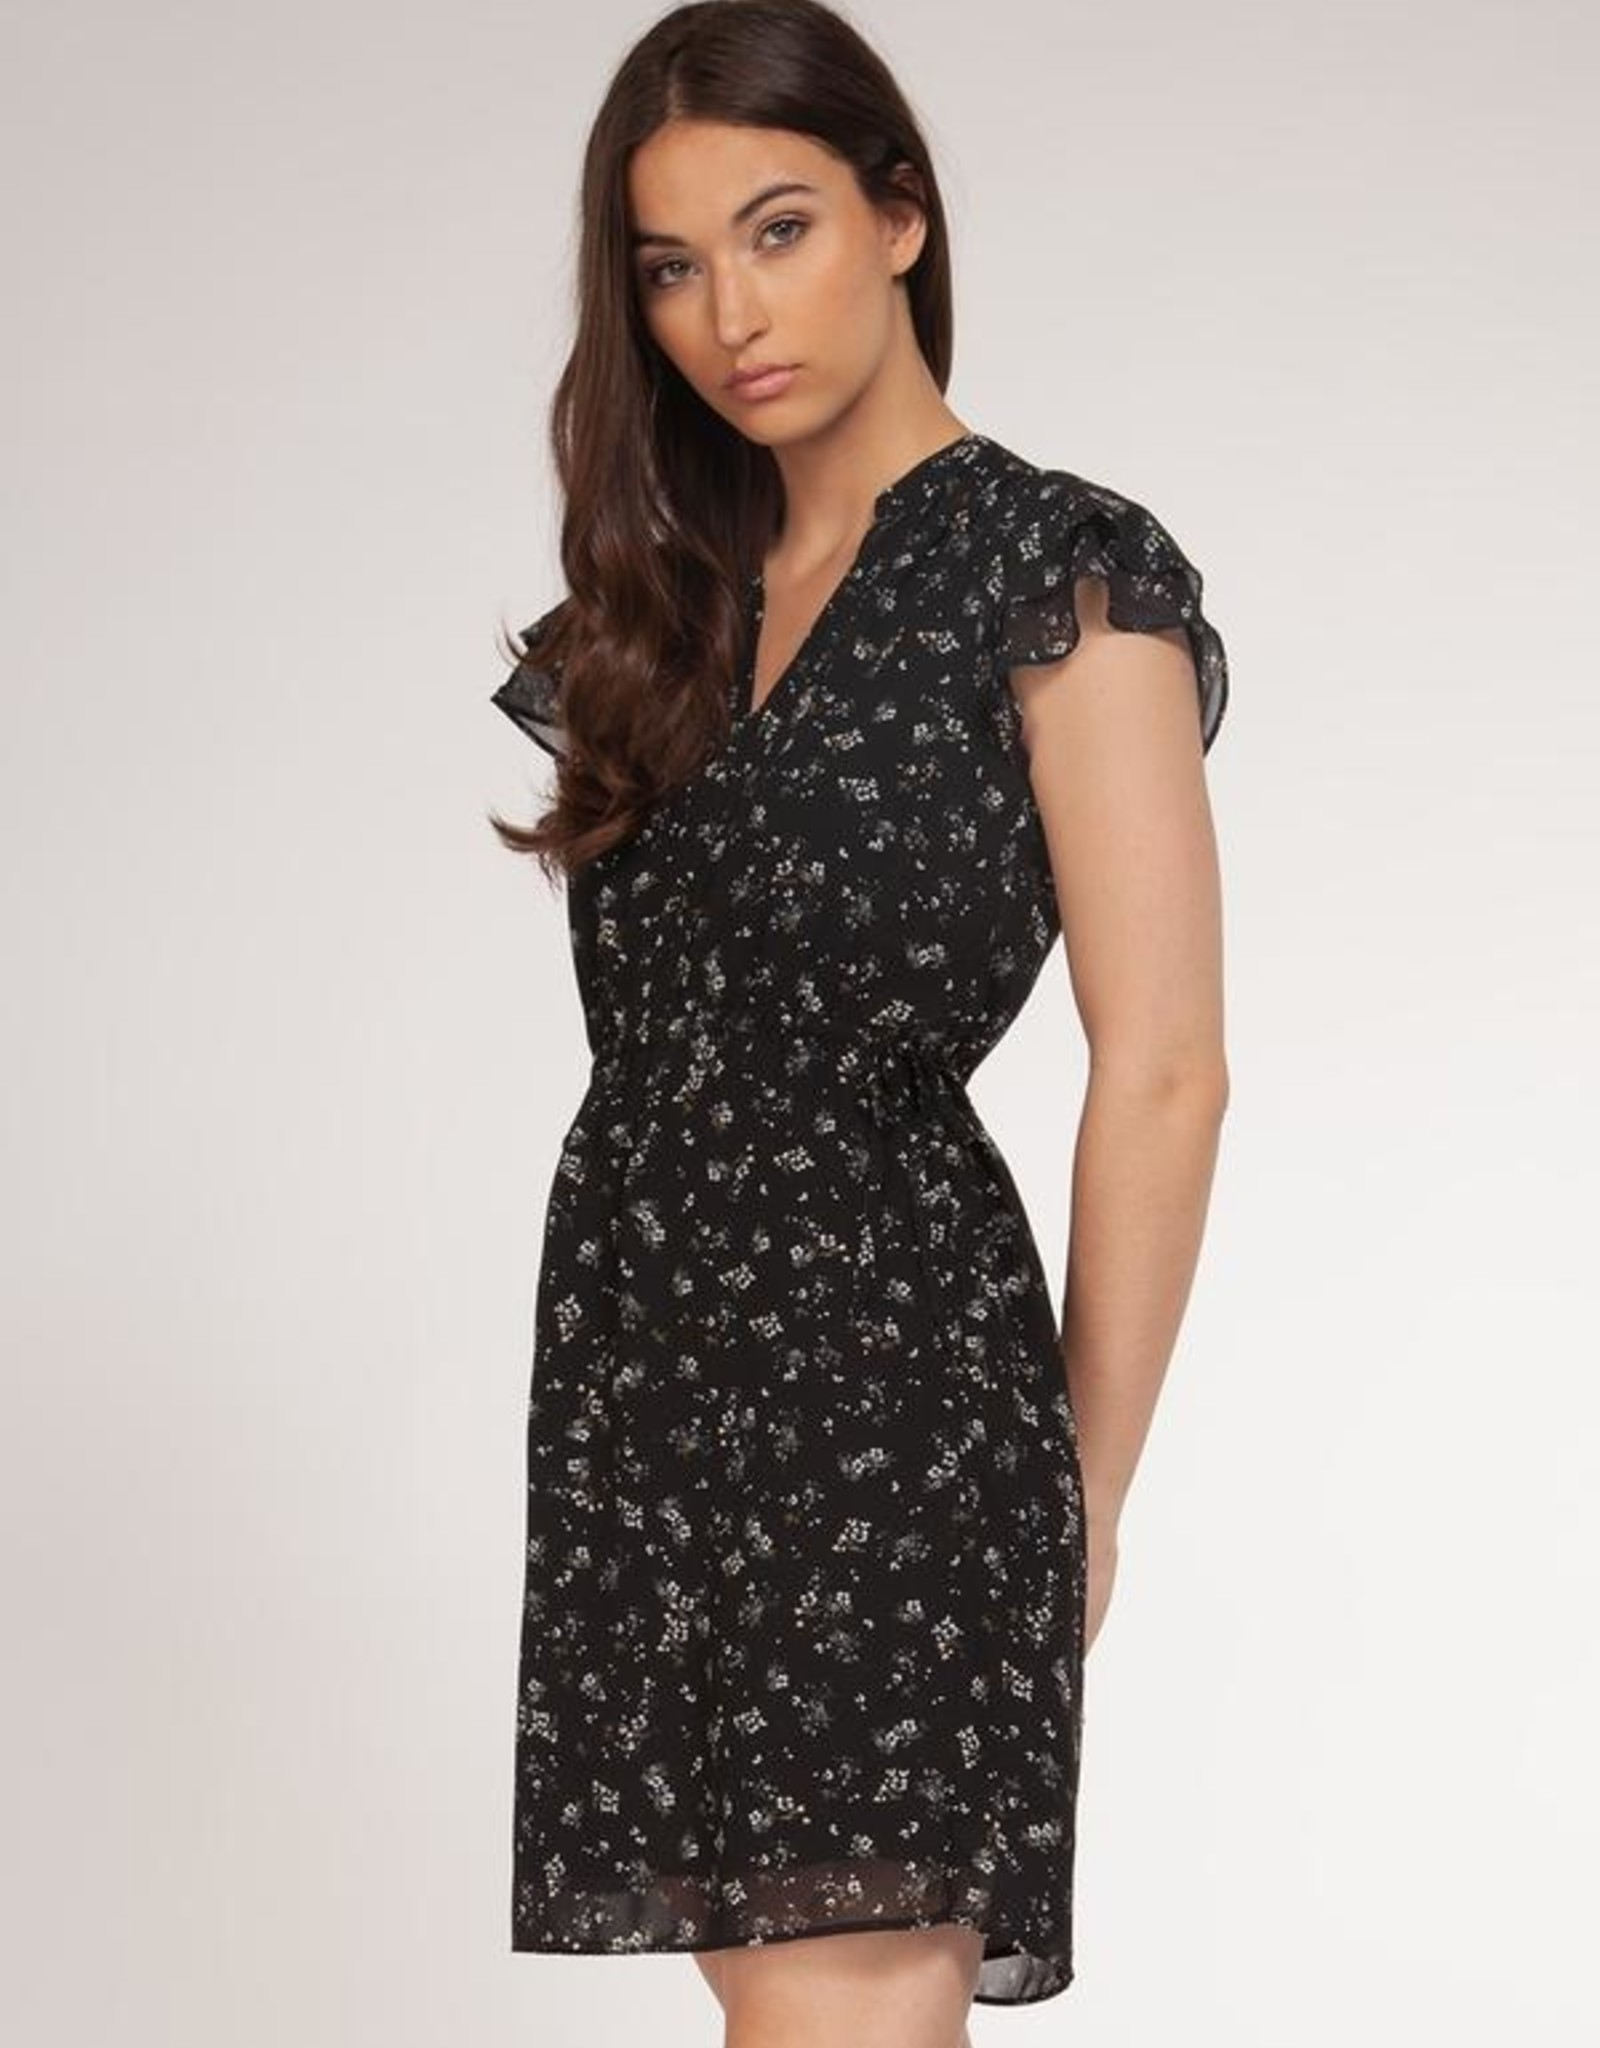 Dex Bros Clothing Co Ltd. Ruffle Sleeve Dress